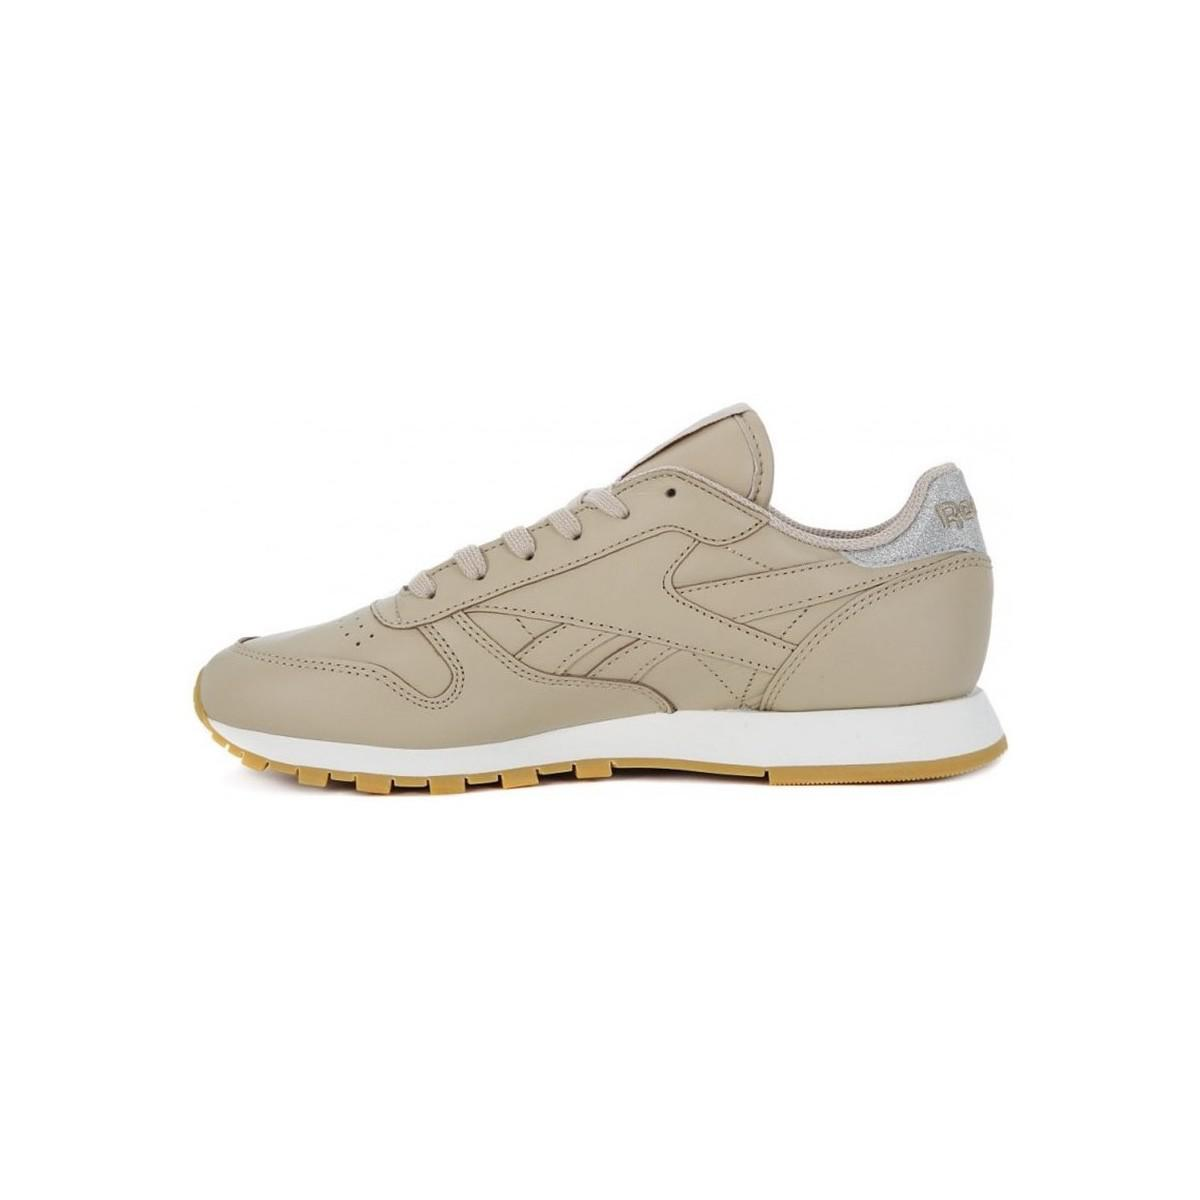 9020cbb9656 Reebok - Natural Classic Lthr Met Diamond Women s Shoes (trainers) In Beige  - Lyst. View fullscreen